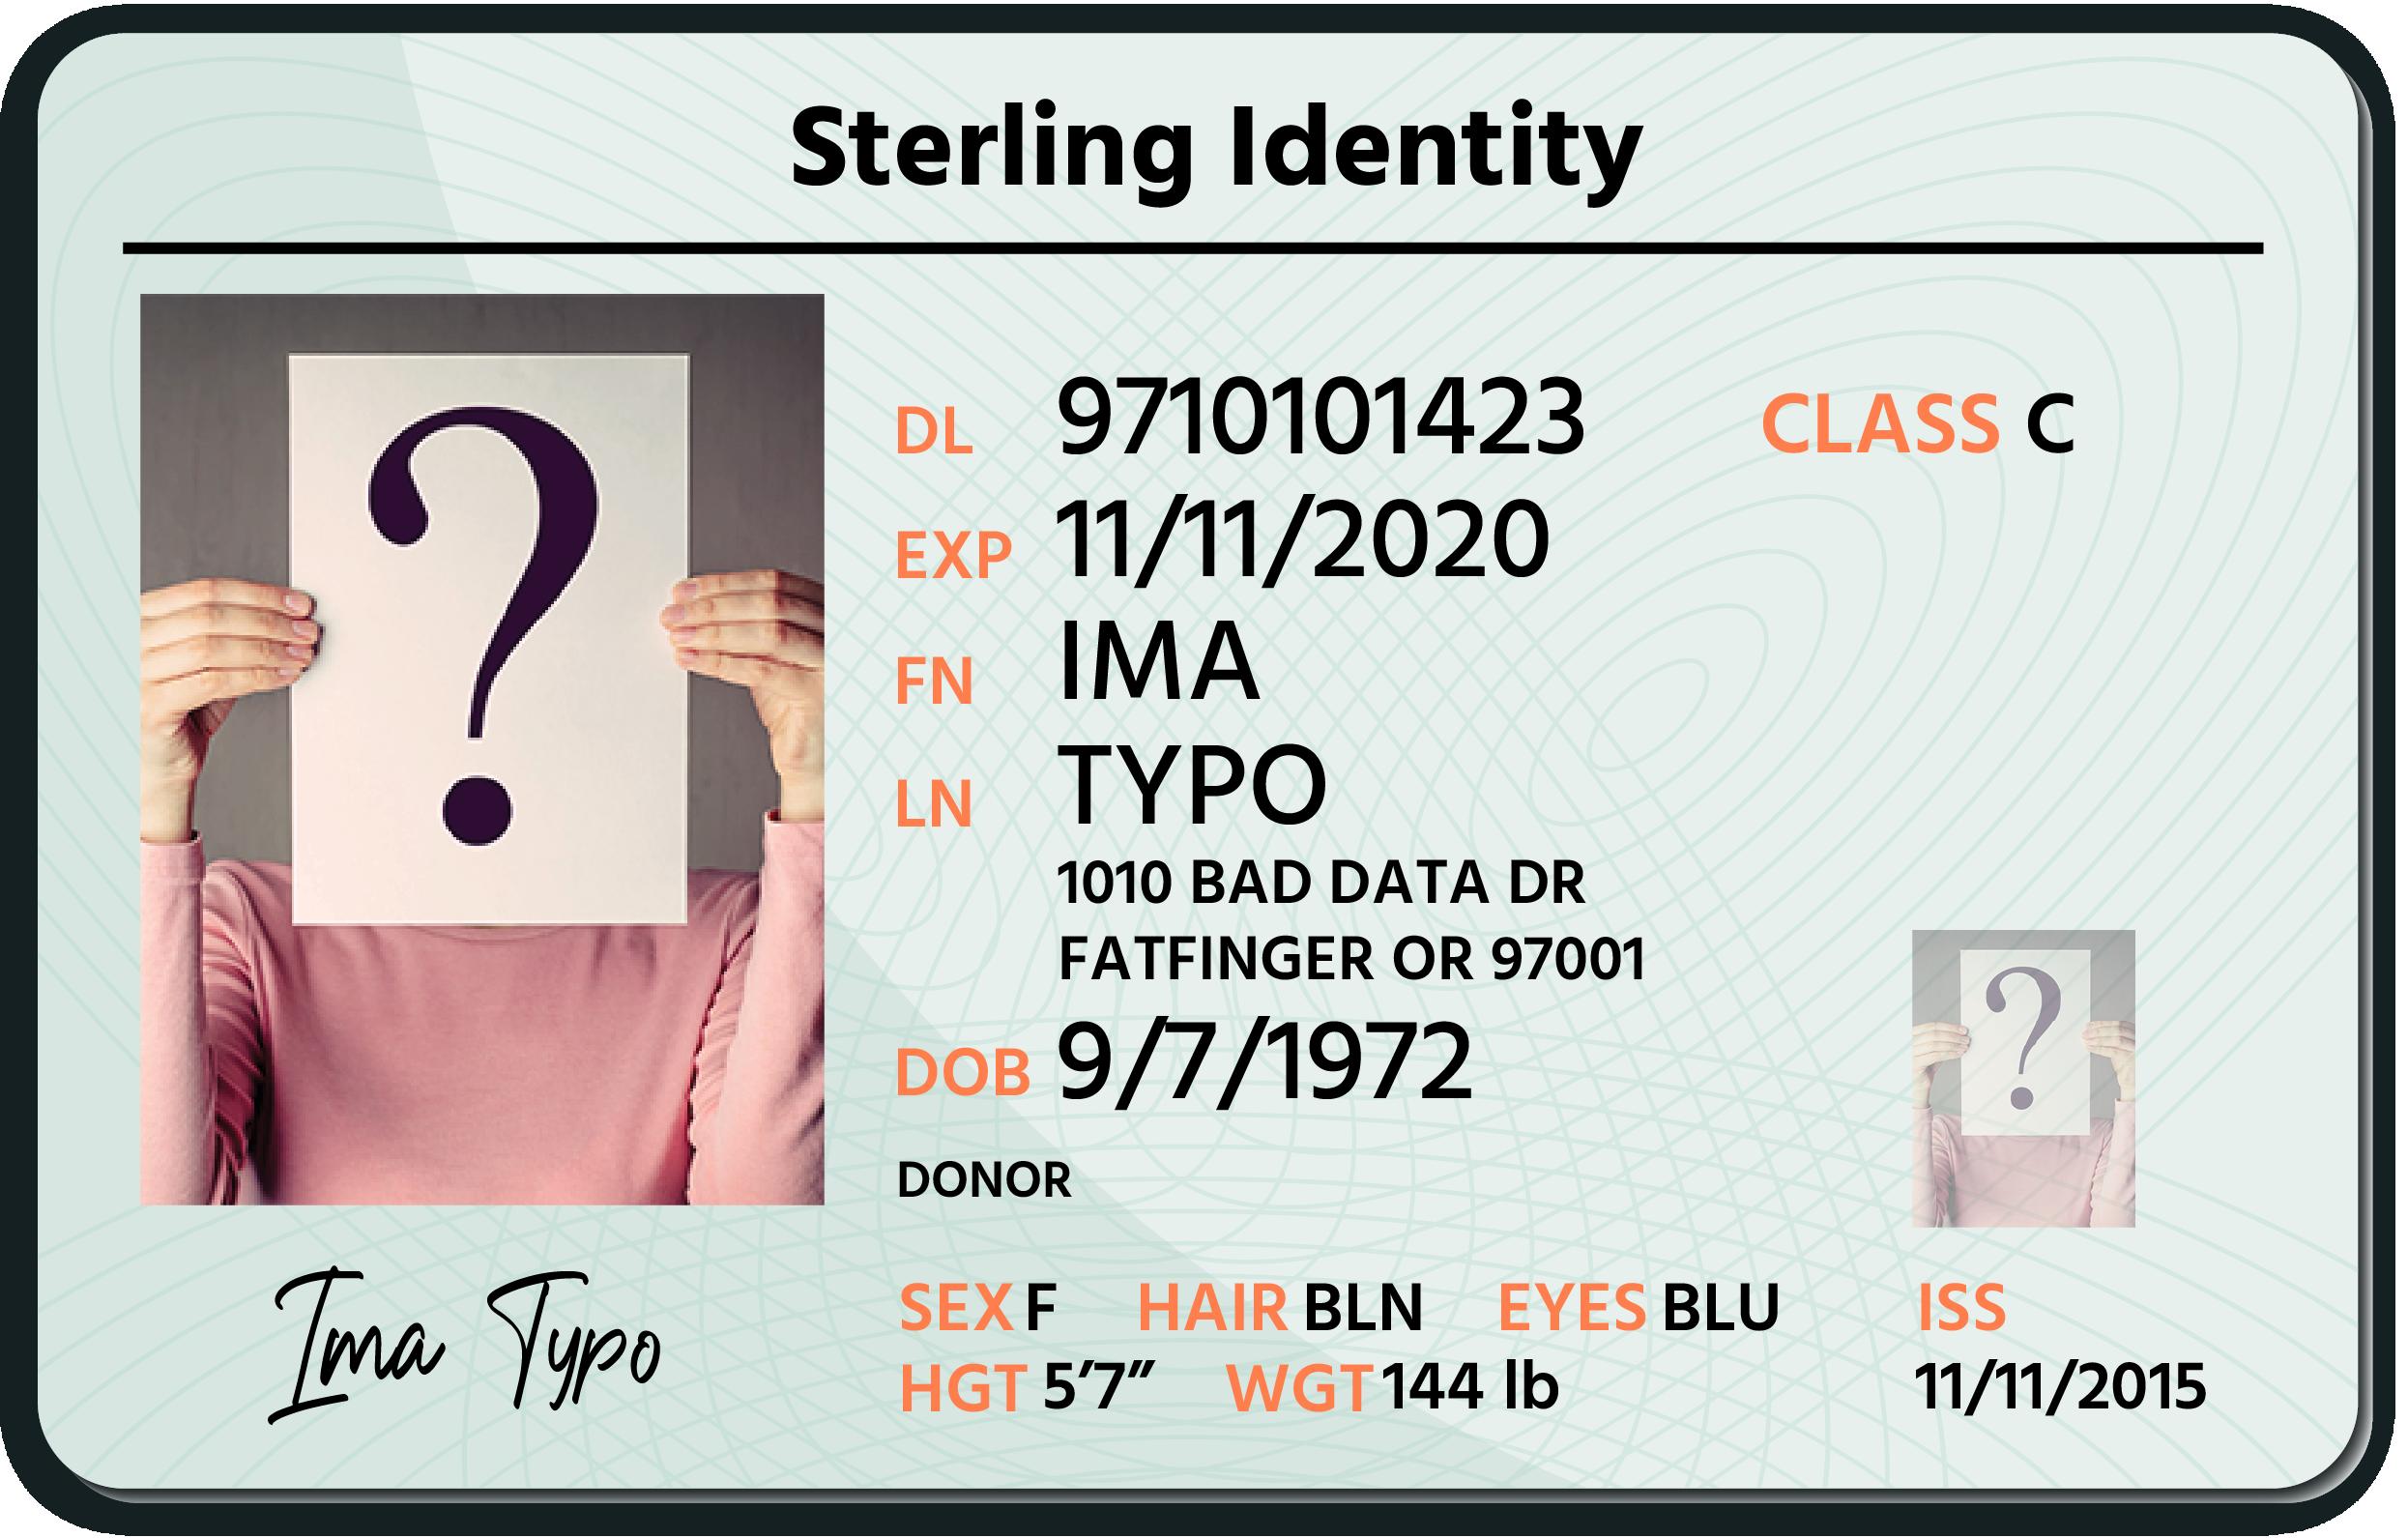 Mock driver's license - front